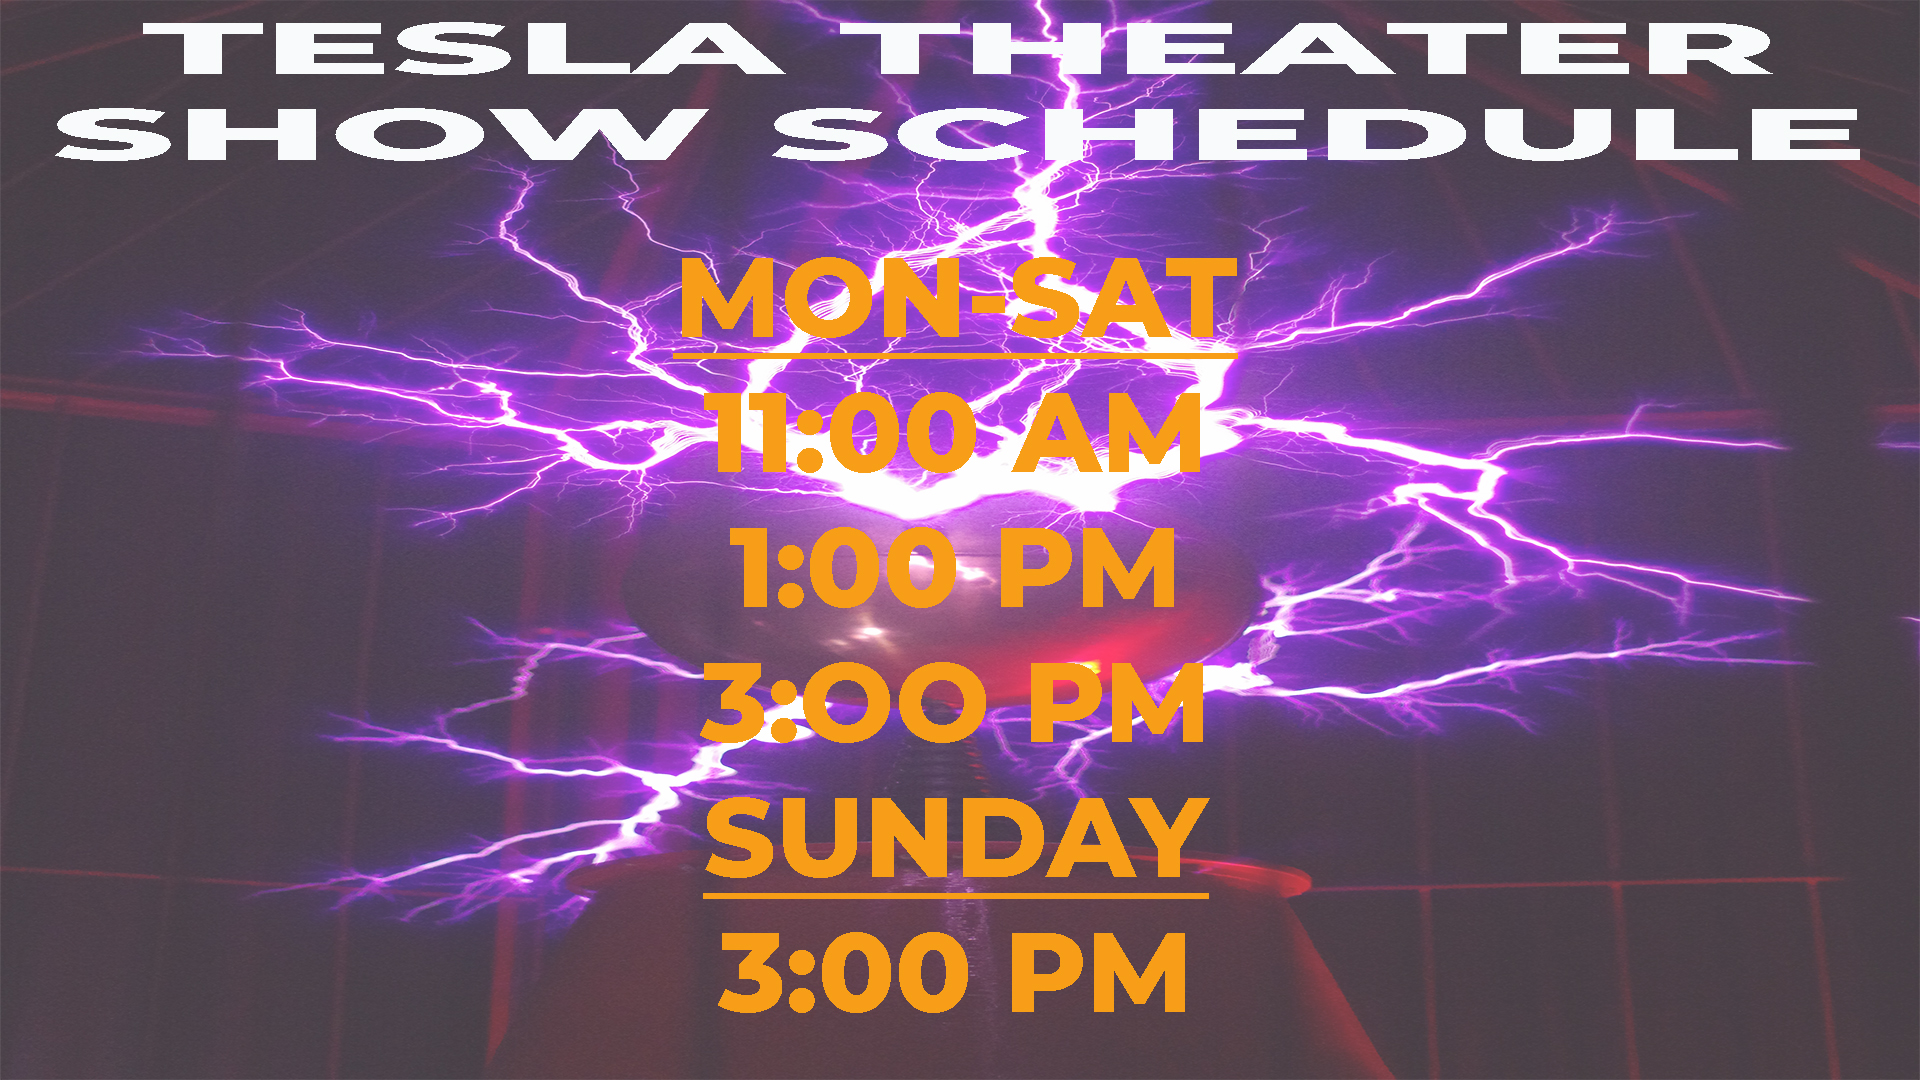 Tesla Show Schedule Monitor-Web.jpg